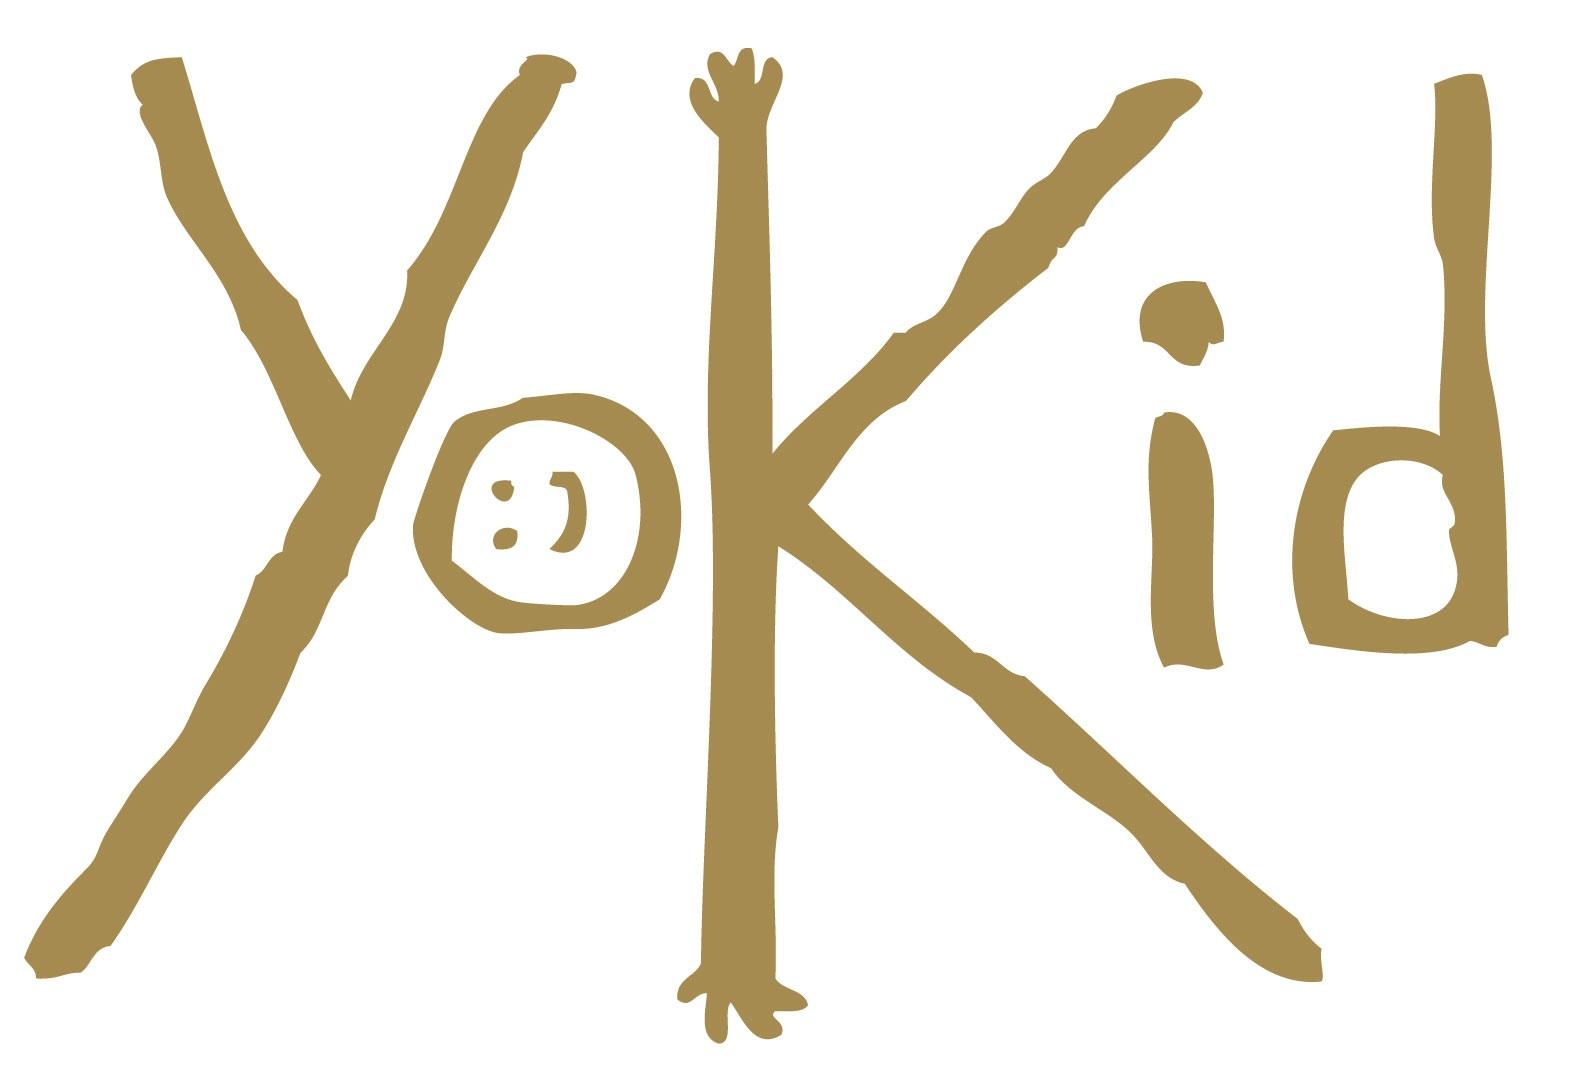 YoKid